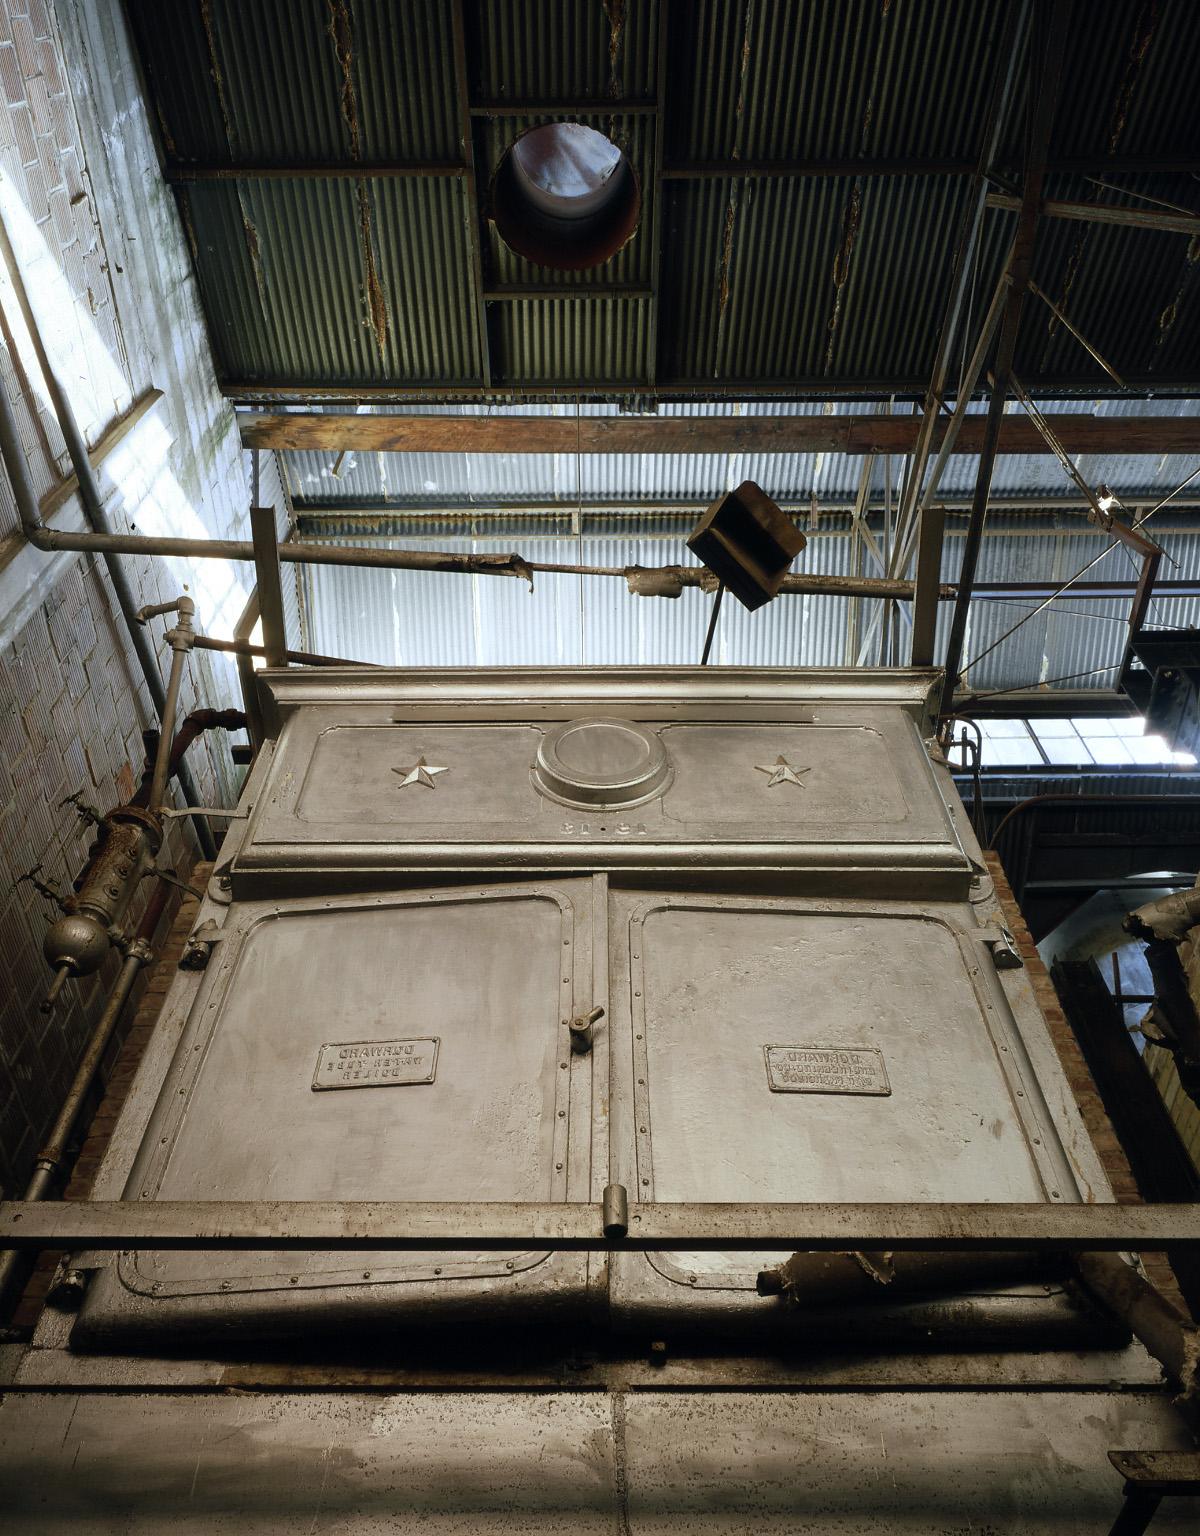 greyboiler